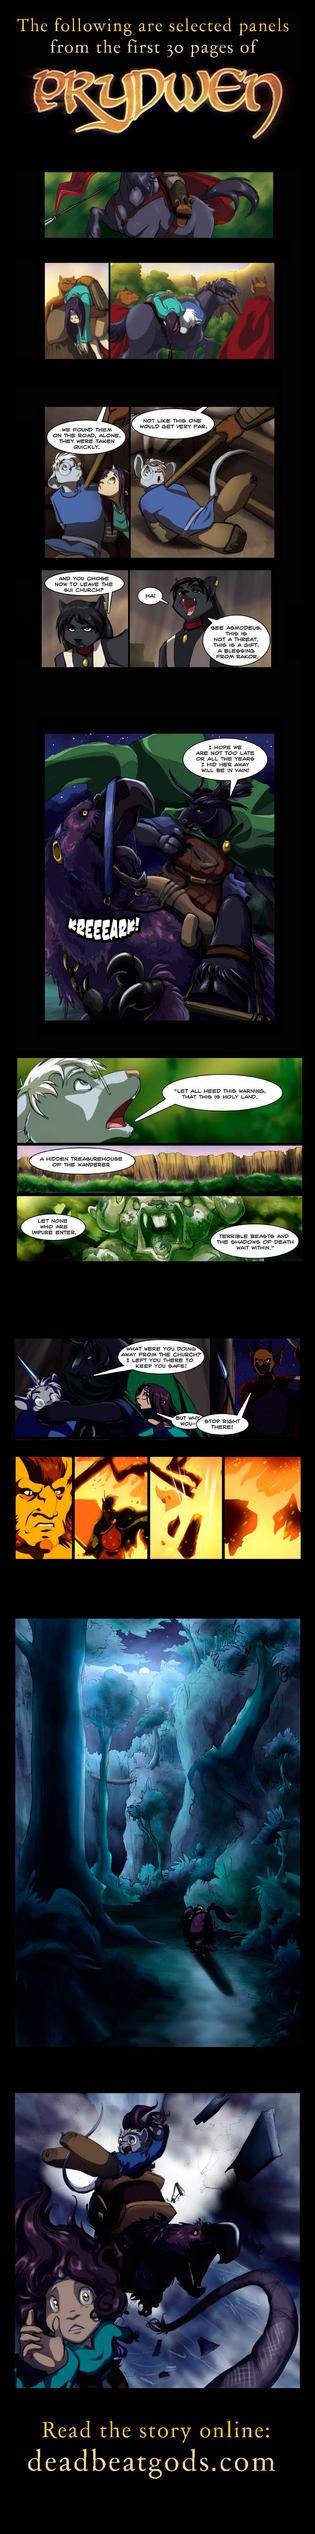 Prydwen Comic Preview by deadbeatgods